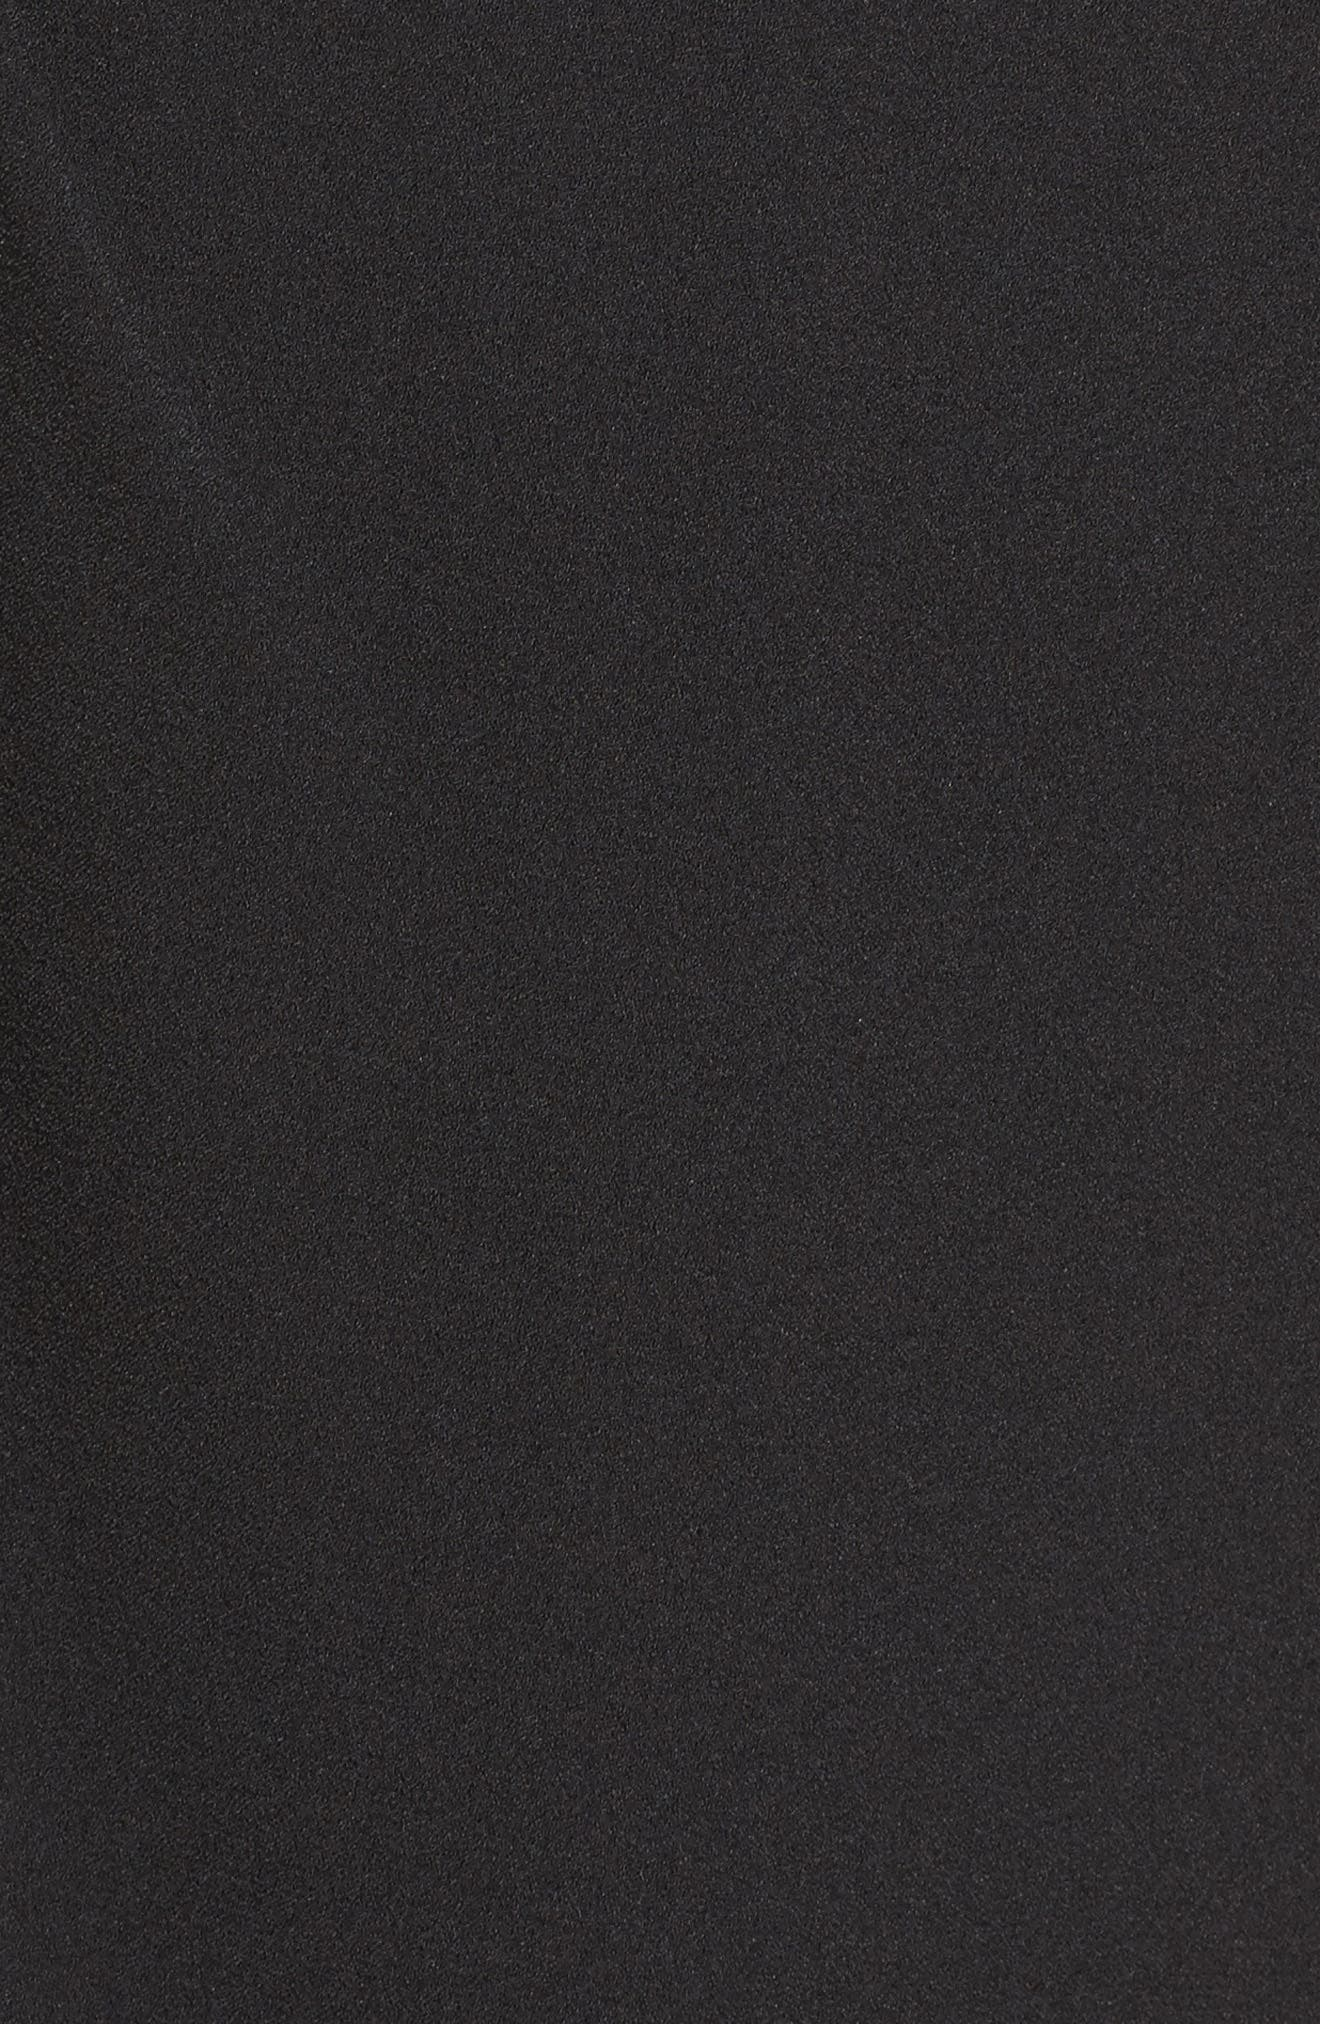 Embellished Ruffle Sheath Dress,                             Alternate thumbnail 5, color,                             001